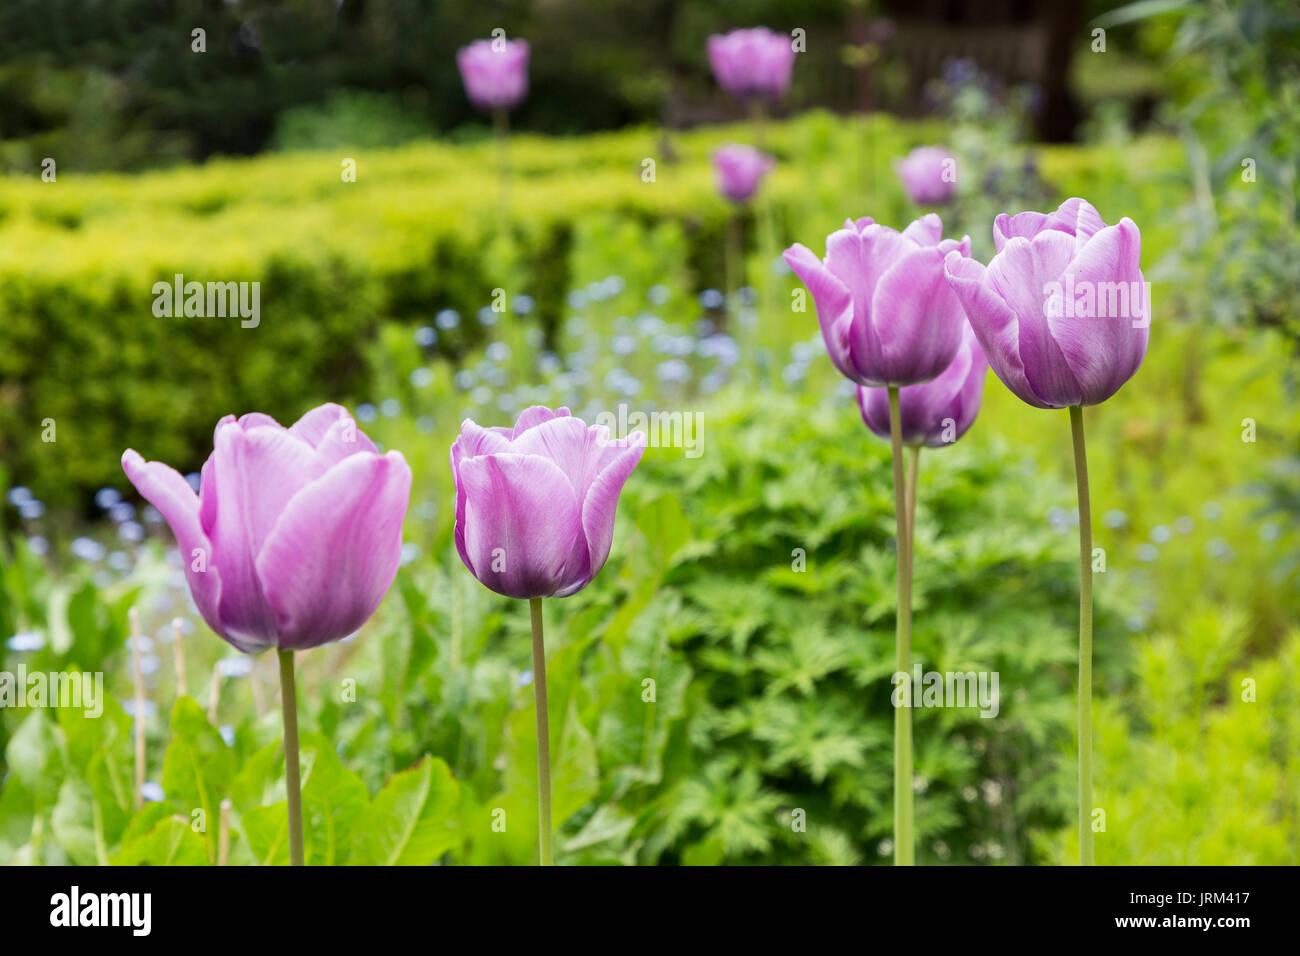 Tulips in public gardens, Linda Vista, Abergavenny, Wales, UK - Stock Image